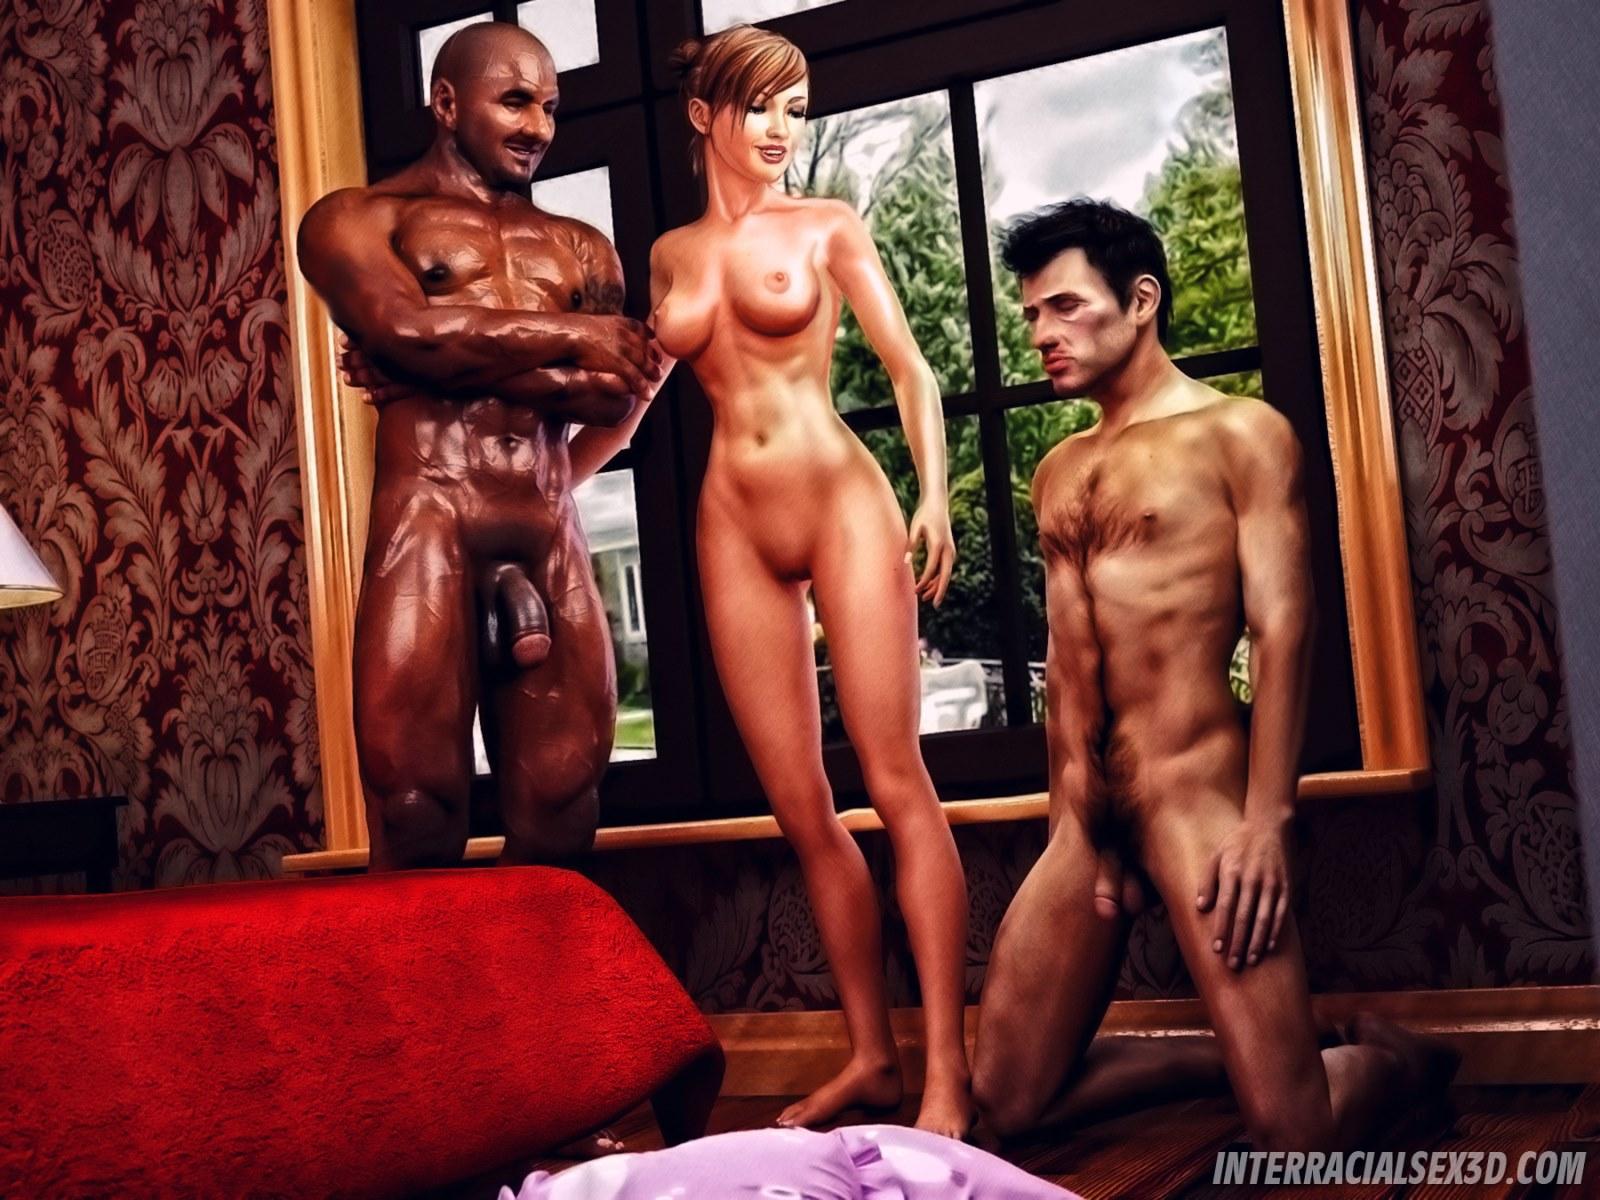 Cuckold Husband Initiation- Interracialsex3d image 1